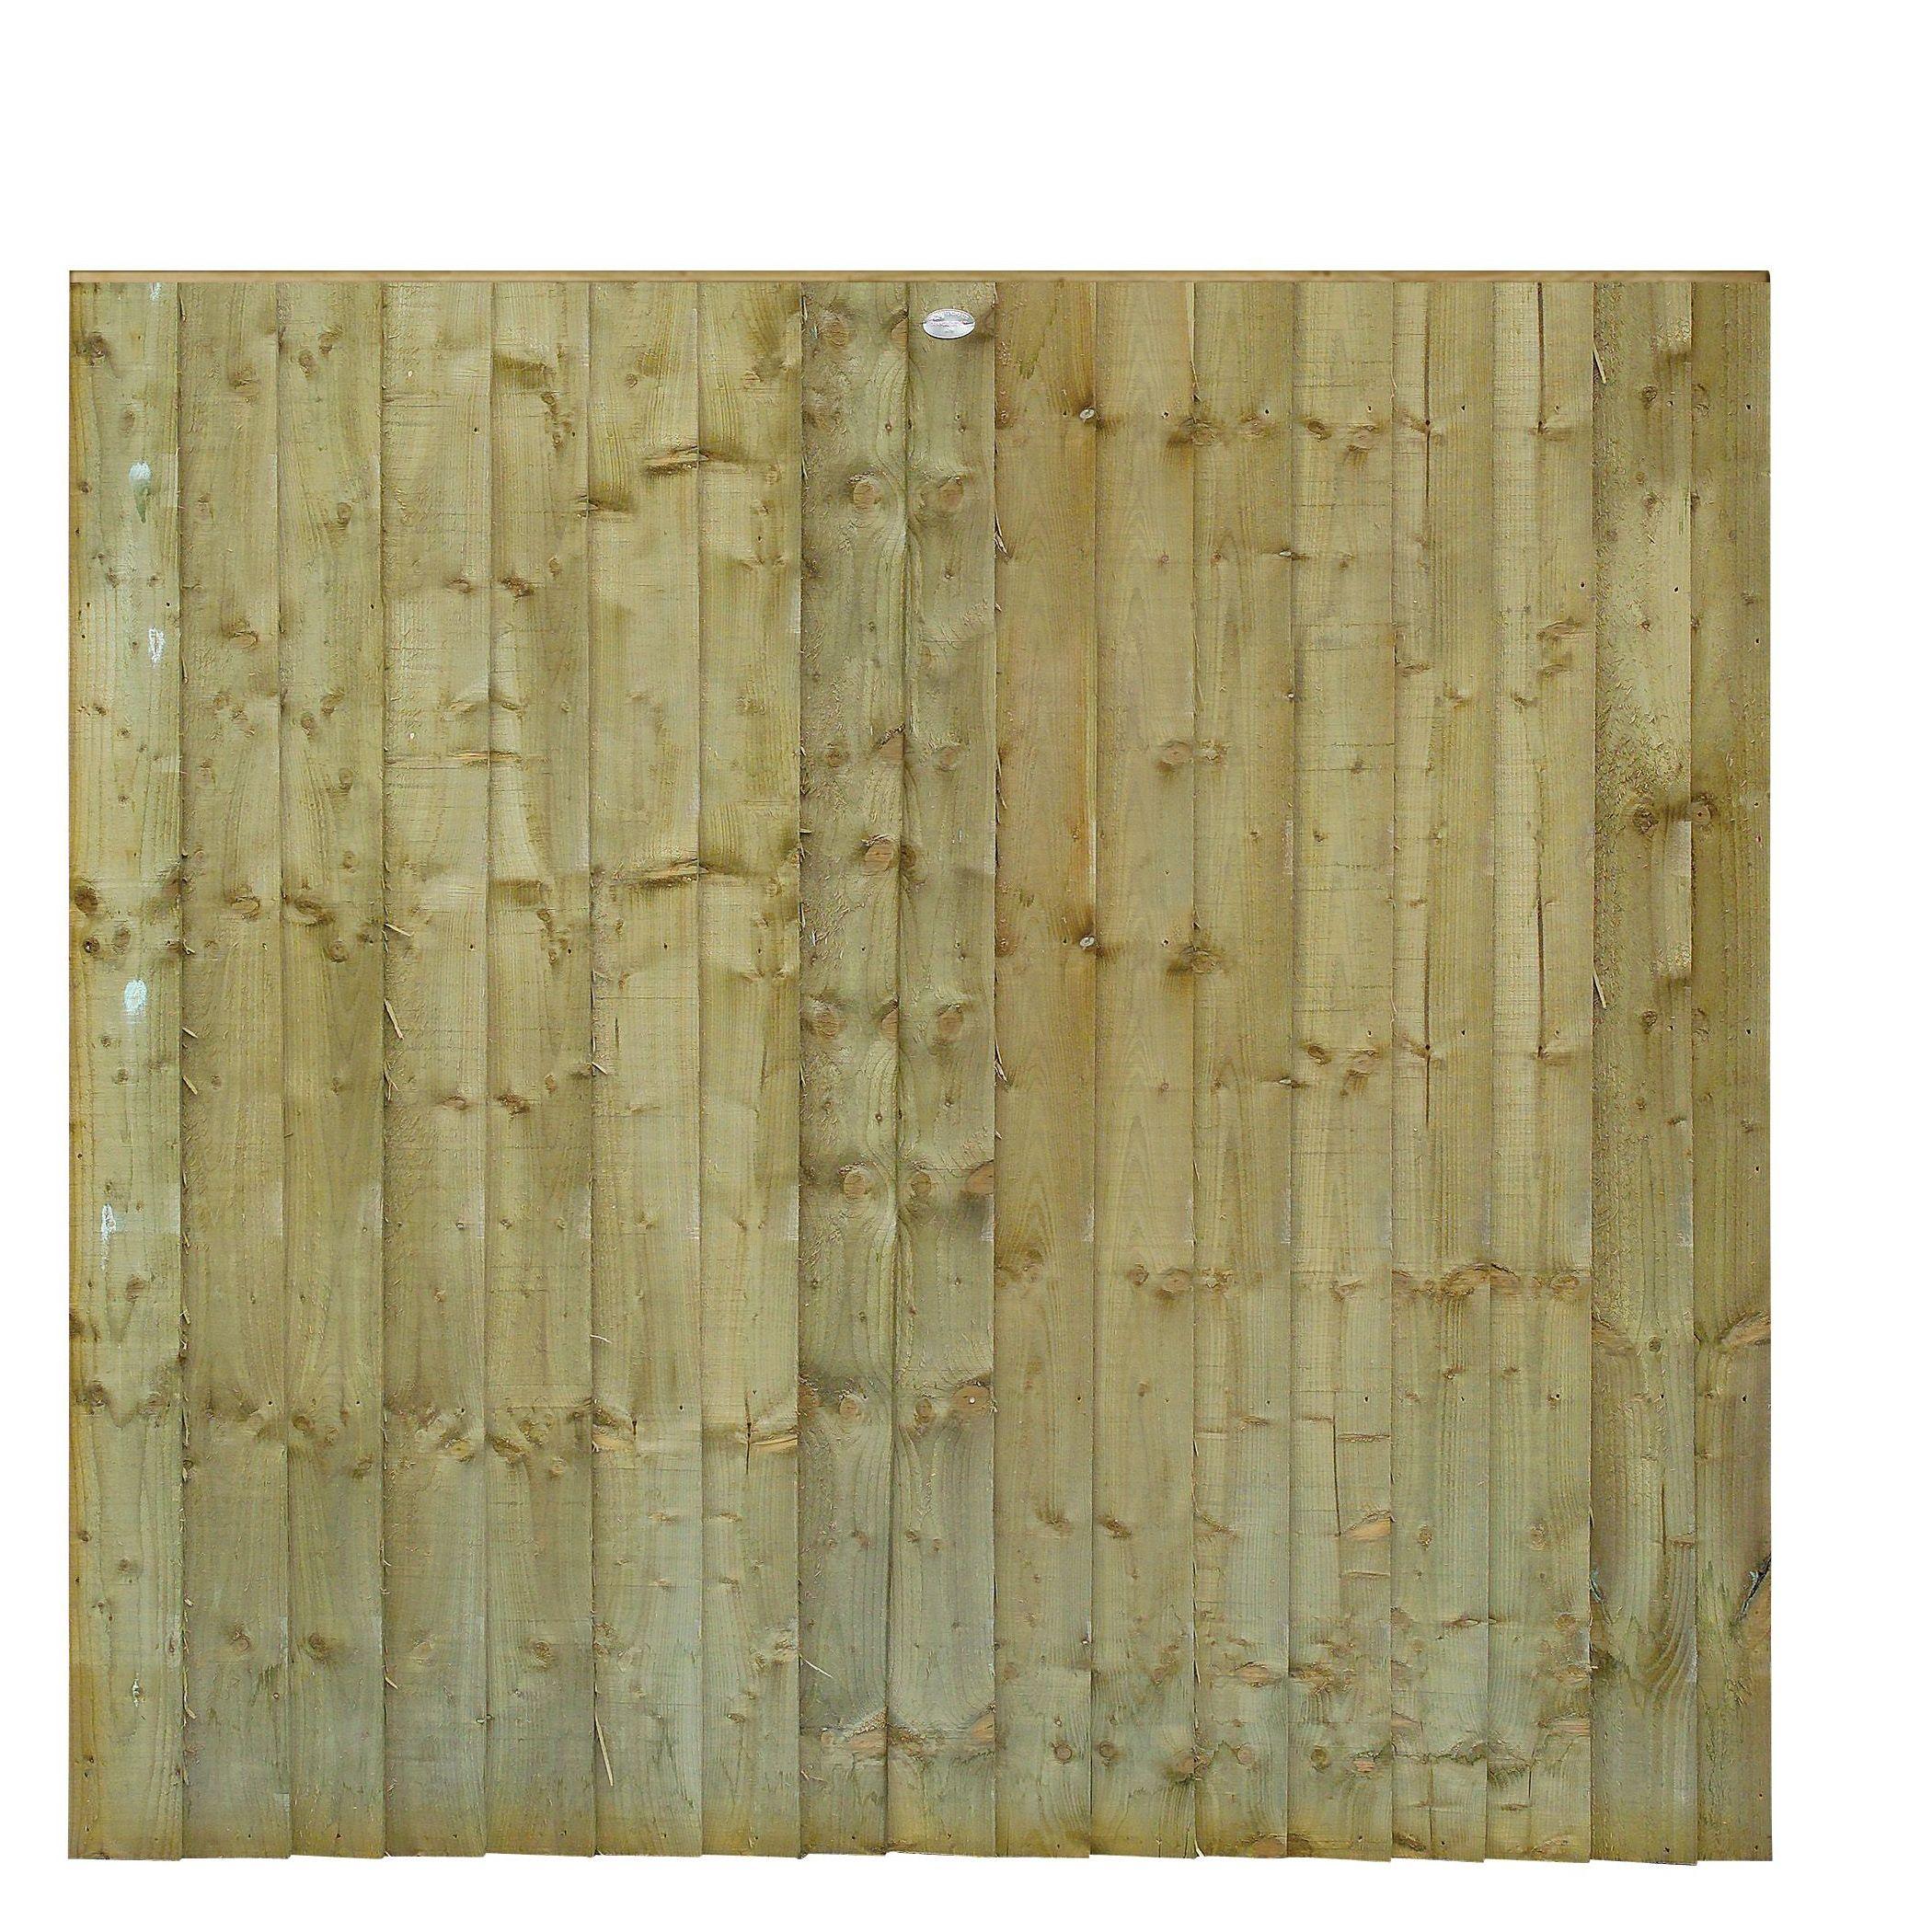 5019063201403 02c?crop=2, 103,2100,2100&anchor=1052,947&wid=600 - Garden Fence Panels Elite Fencing Panels Fences